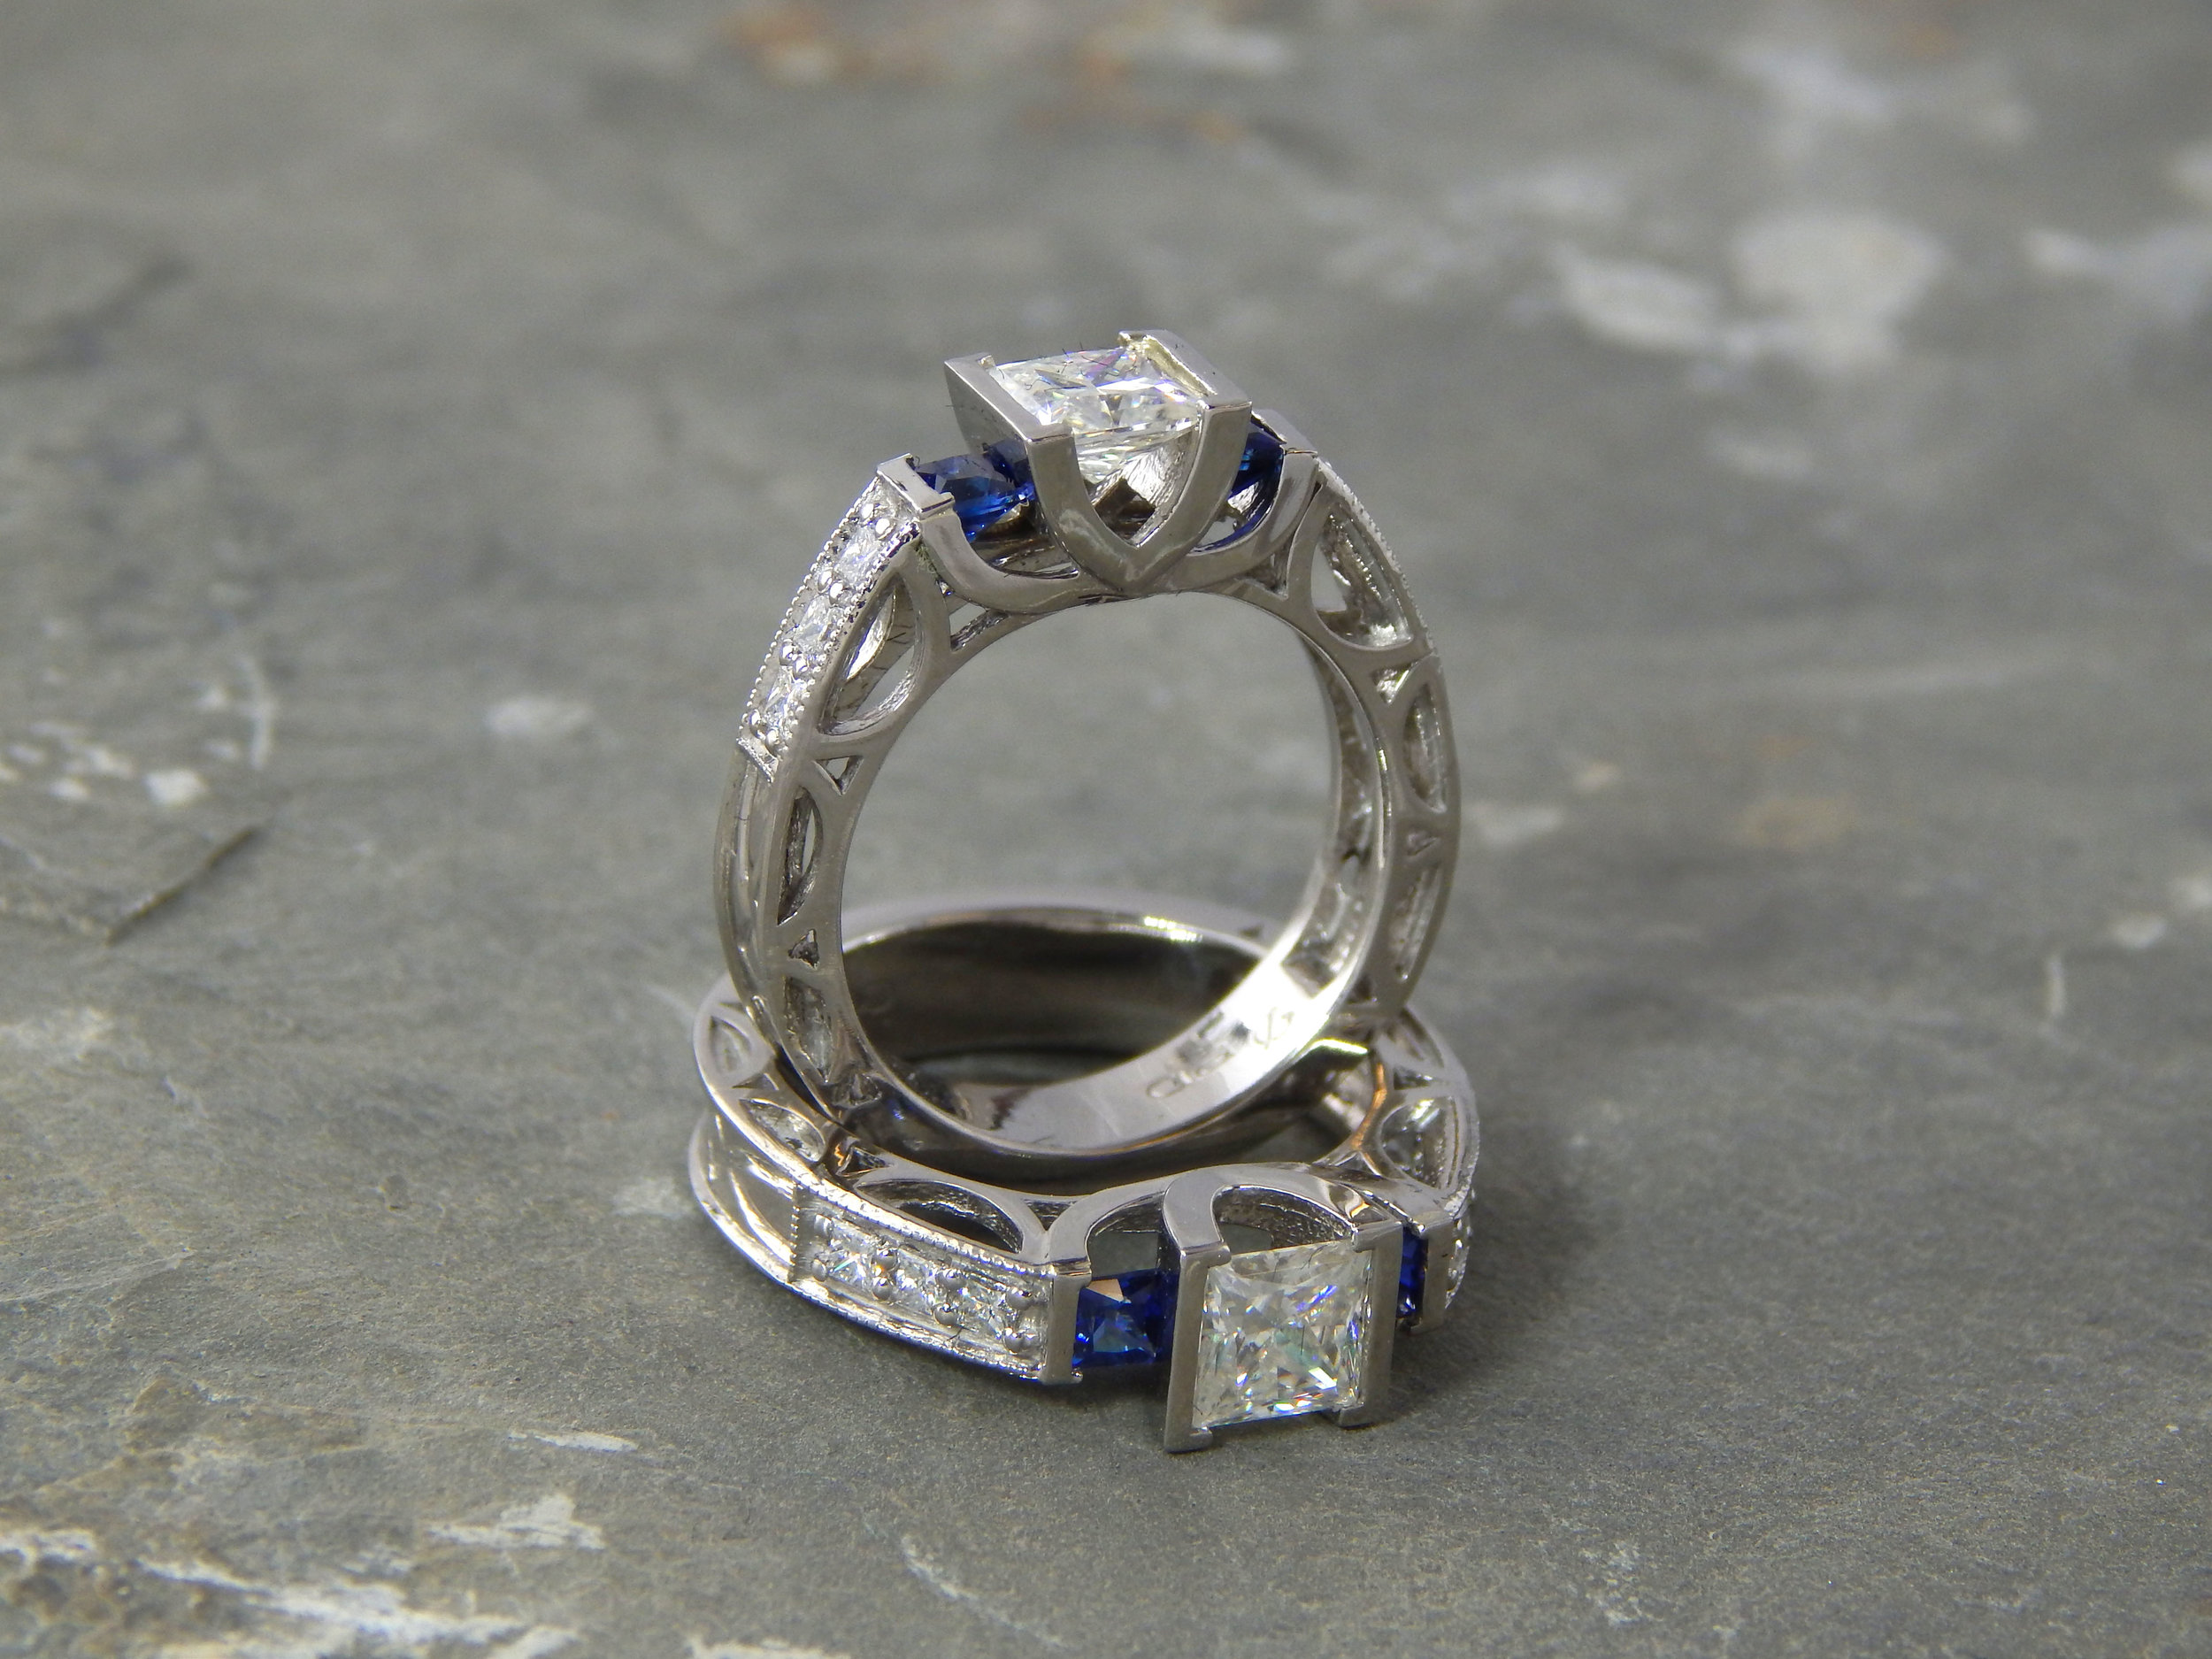 darvier-tension-bridge-sapphire-diamond-wedding-set.JPG